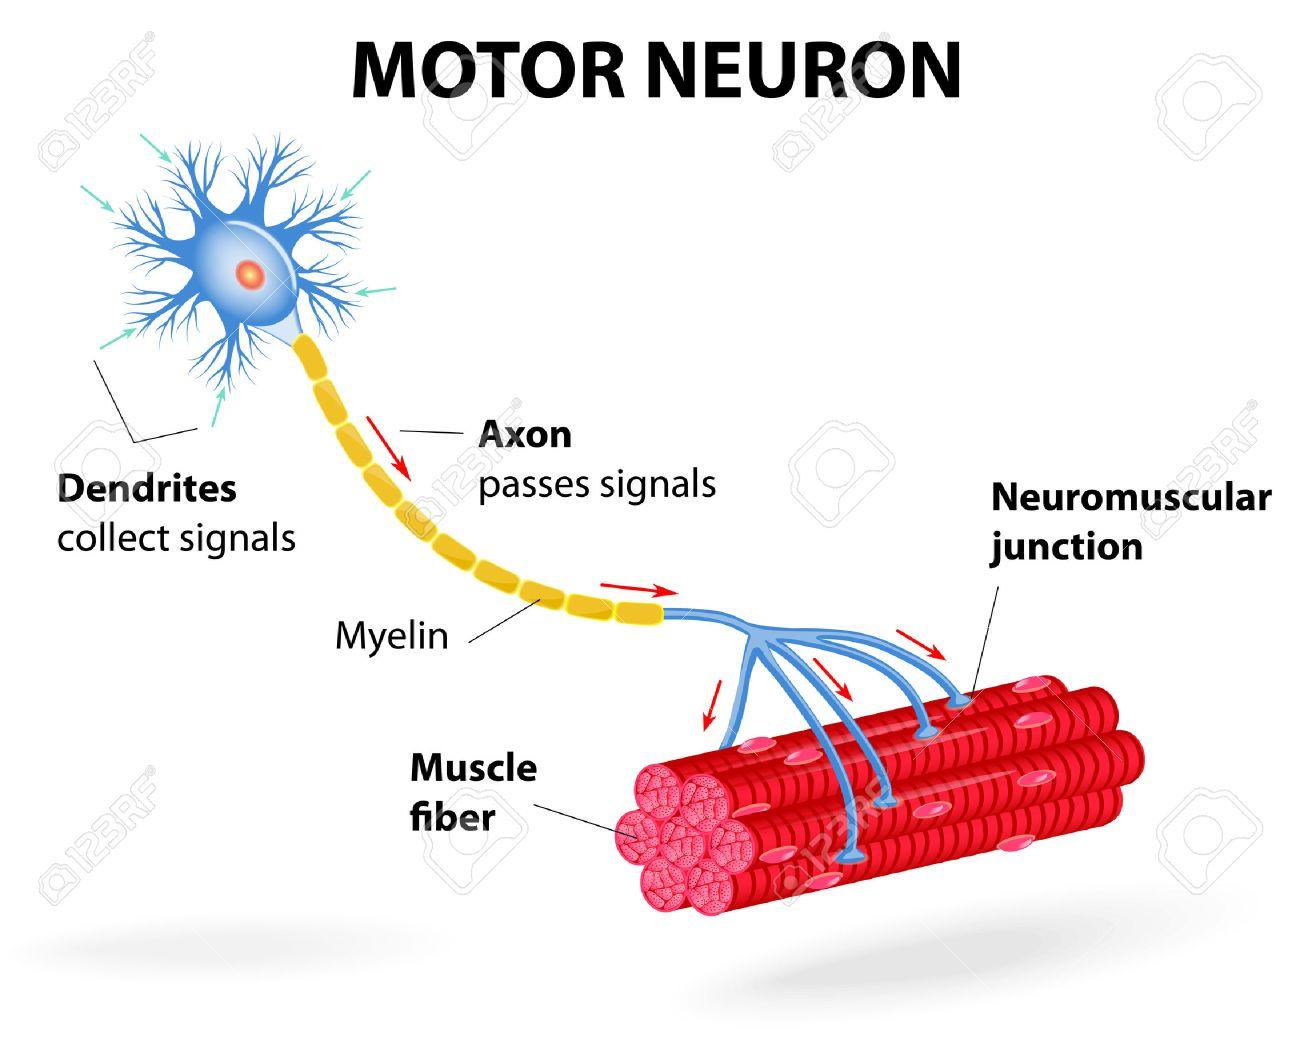 Struktur Motoneuronen. Vektor-Diagramm. Fügen Dendriten, Zellkörper ...